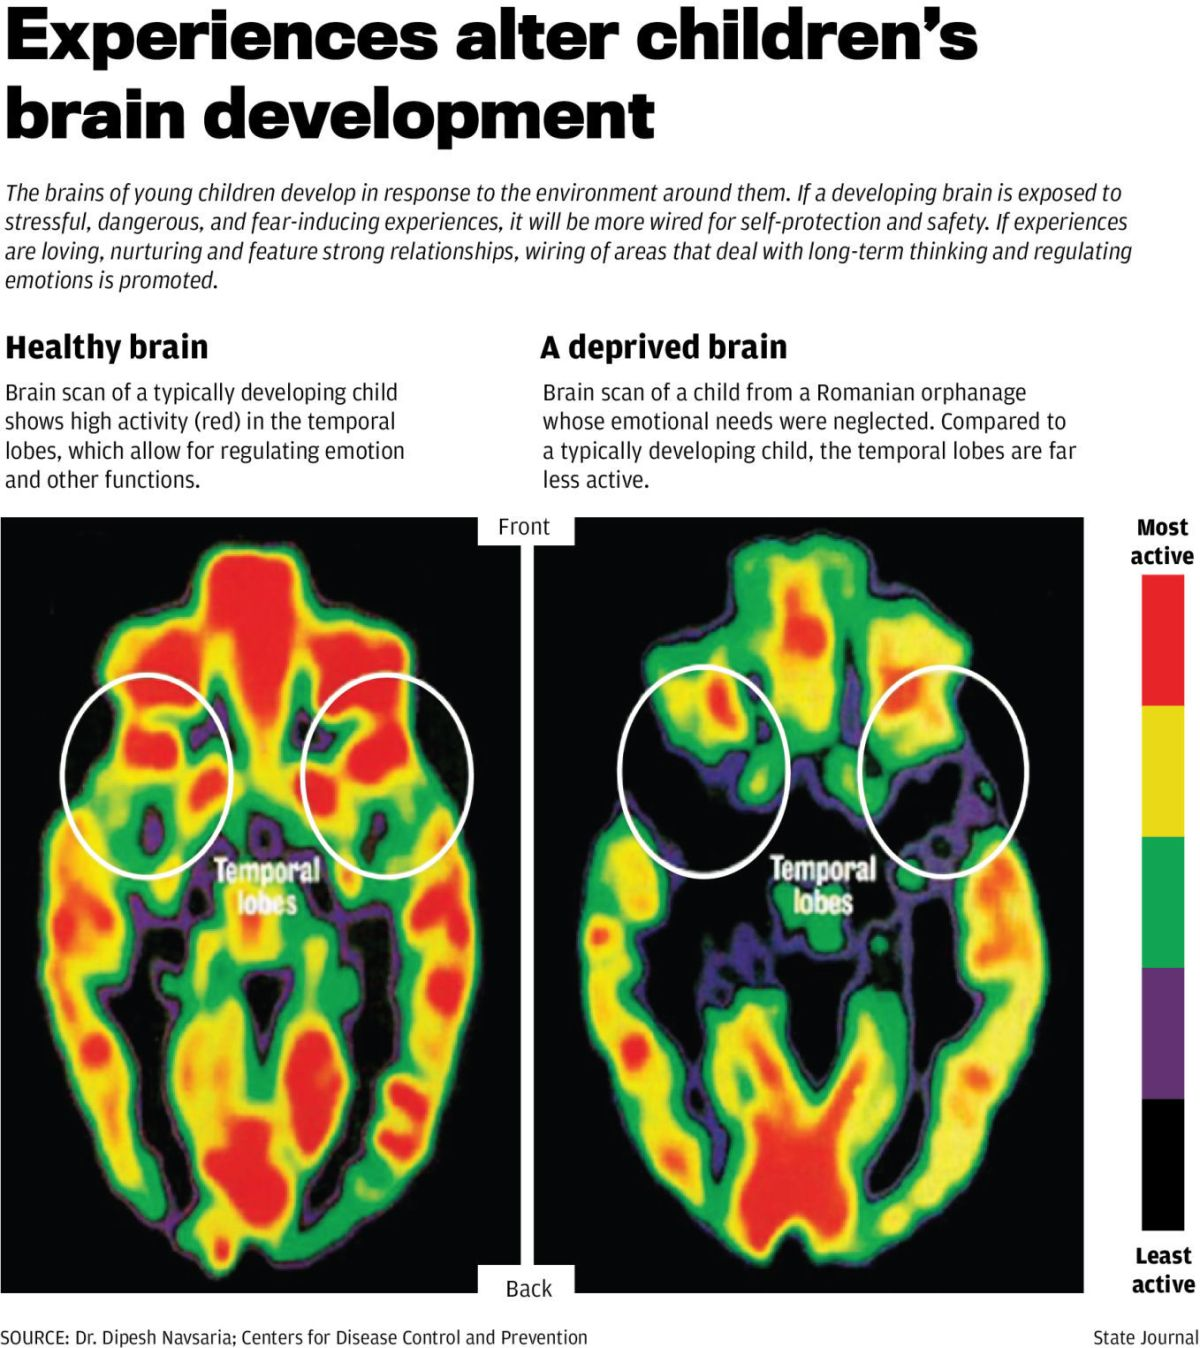 Left unaddressed, childhood trauma can weaken developing brain | Crime | madison